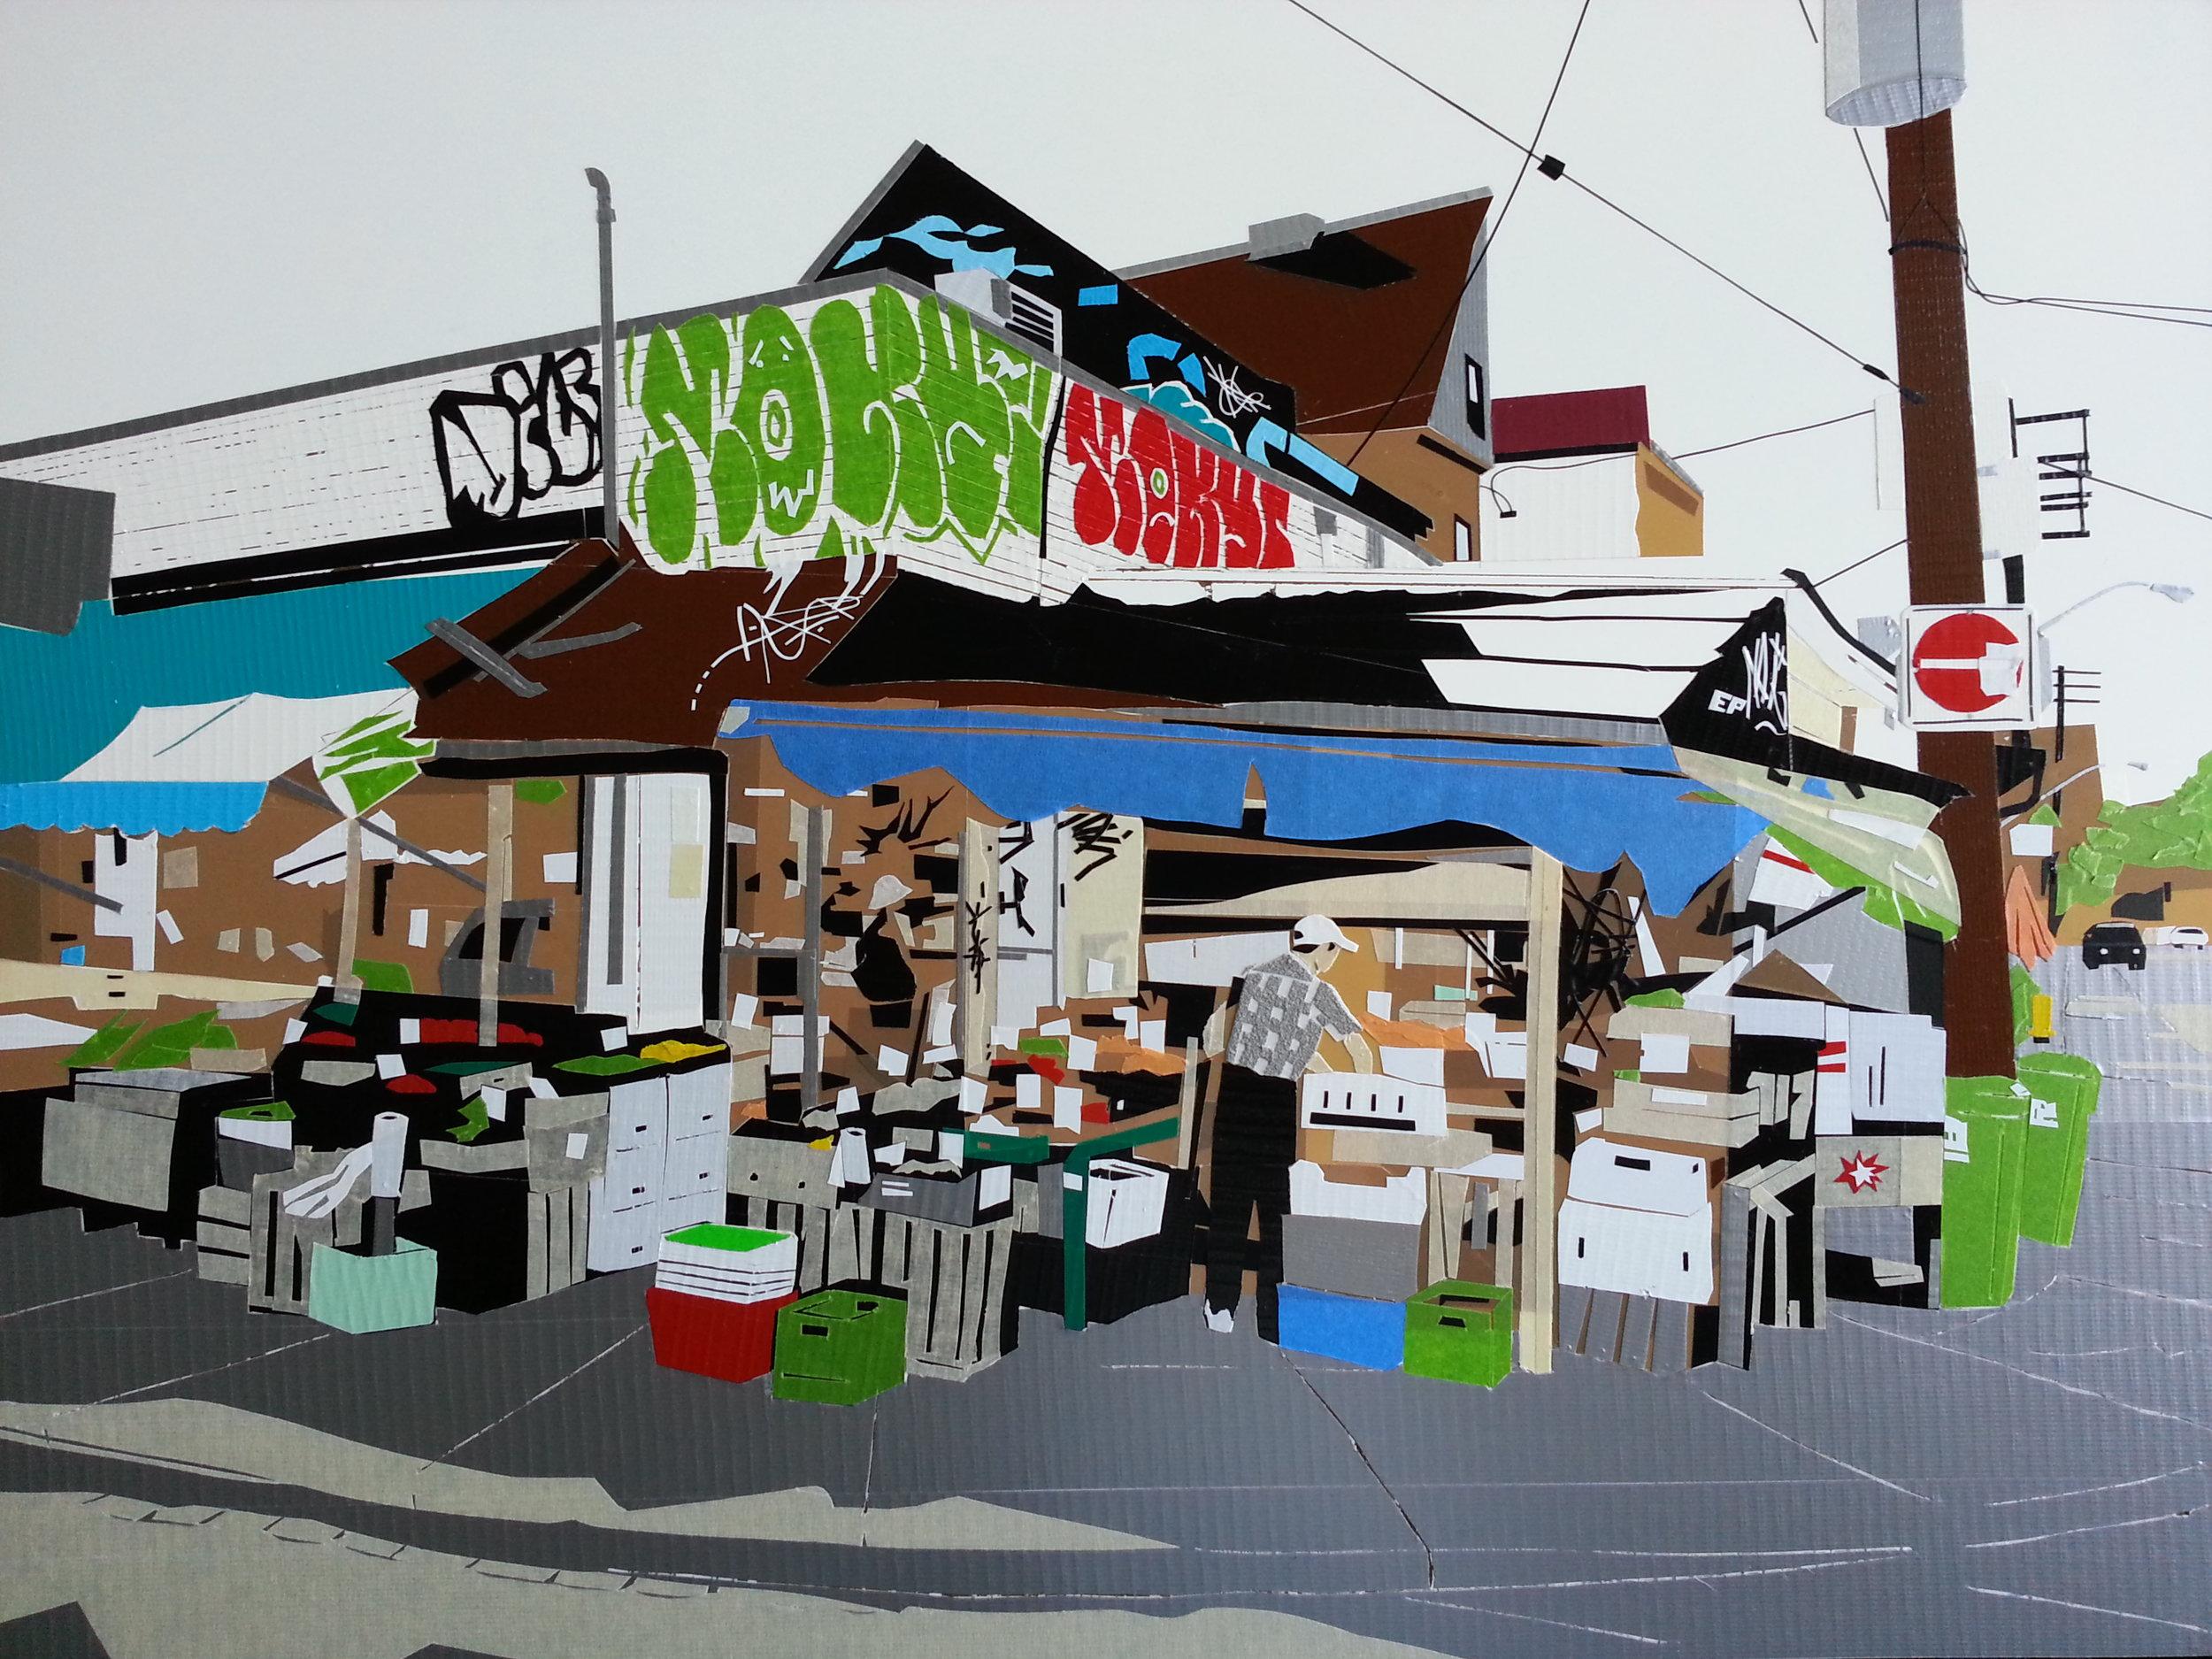 Kensington_Market.jpg